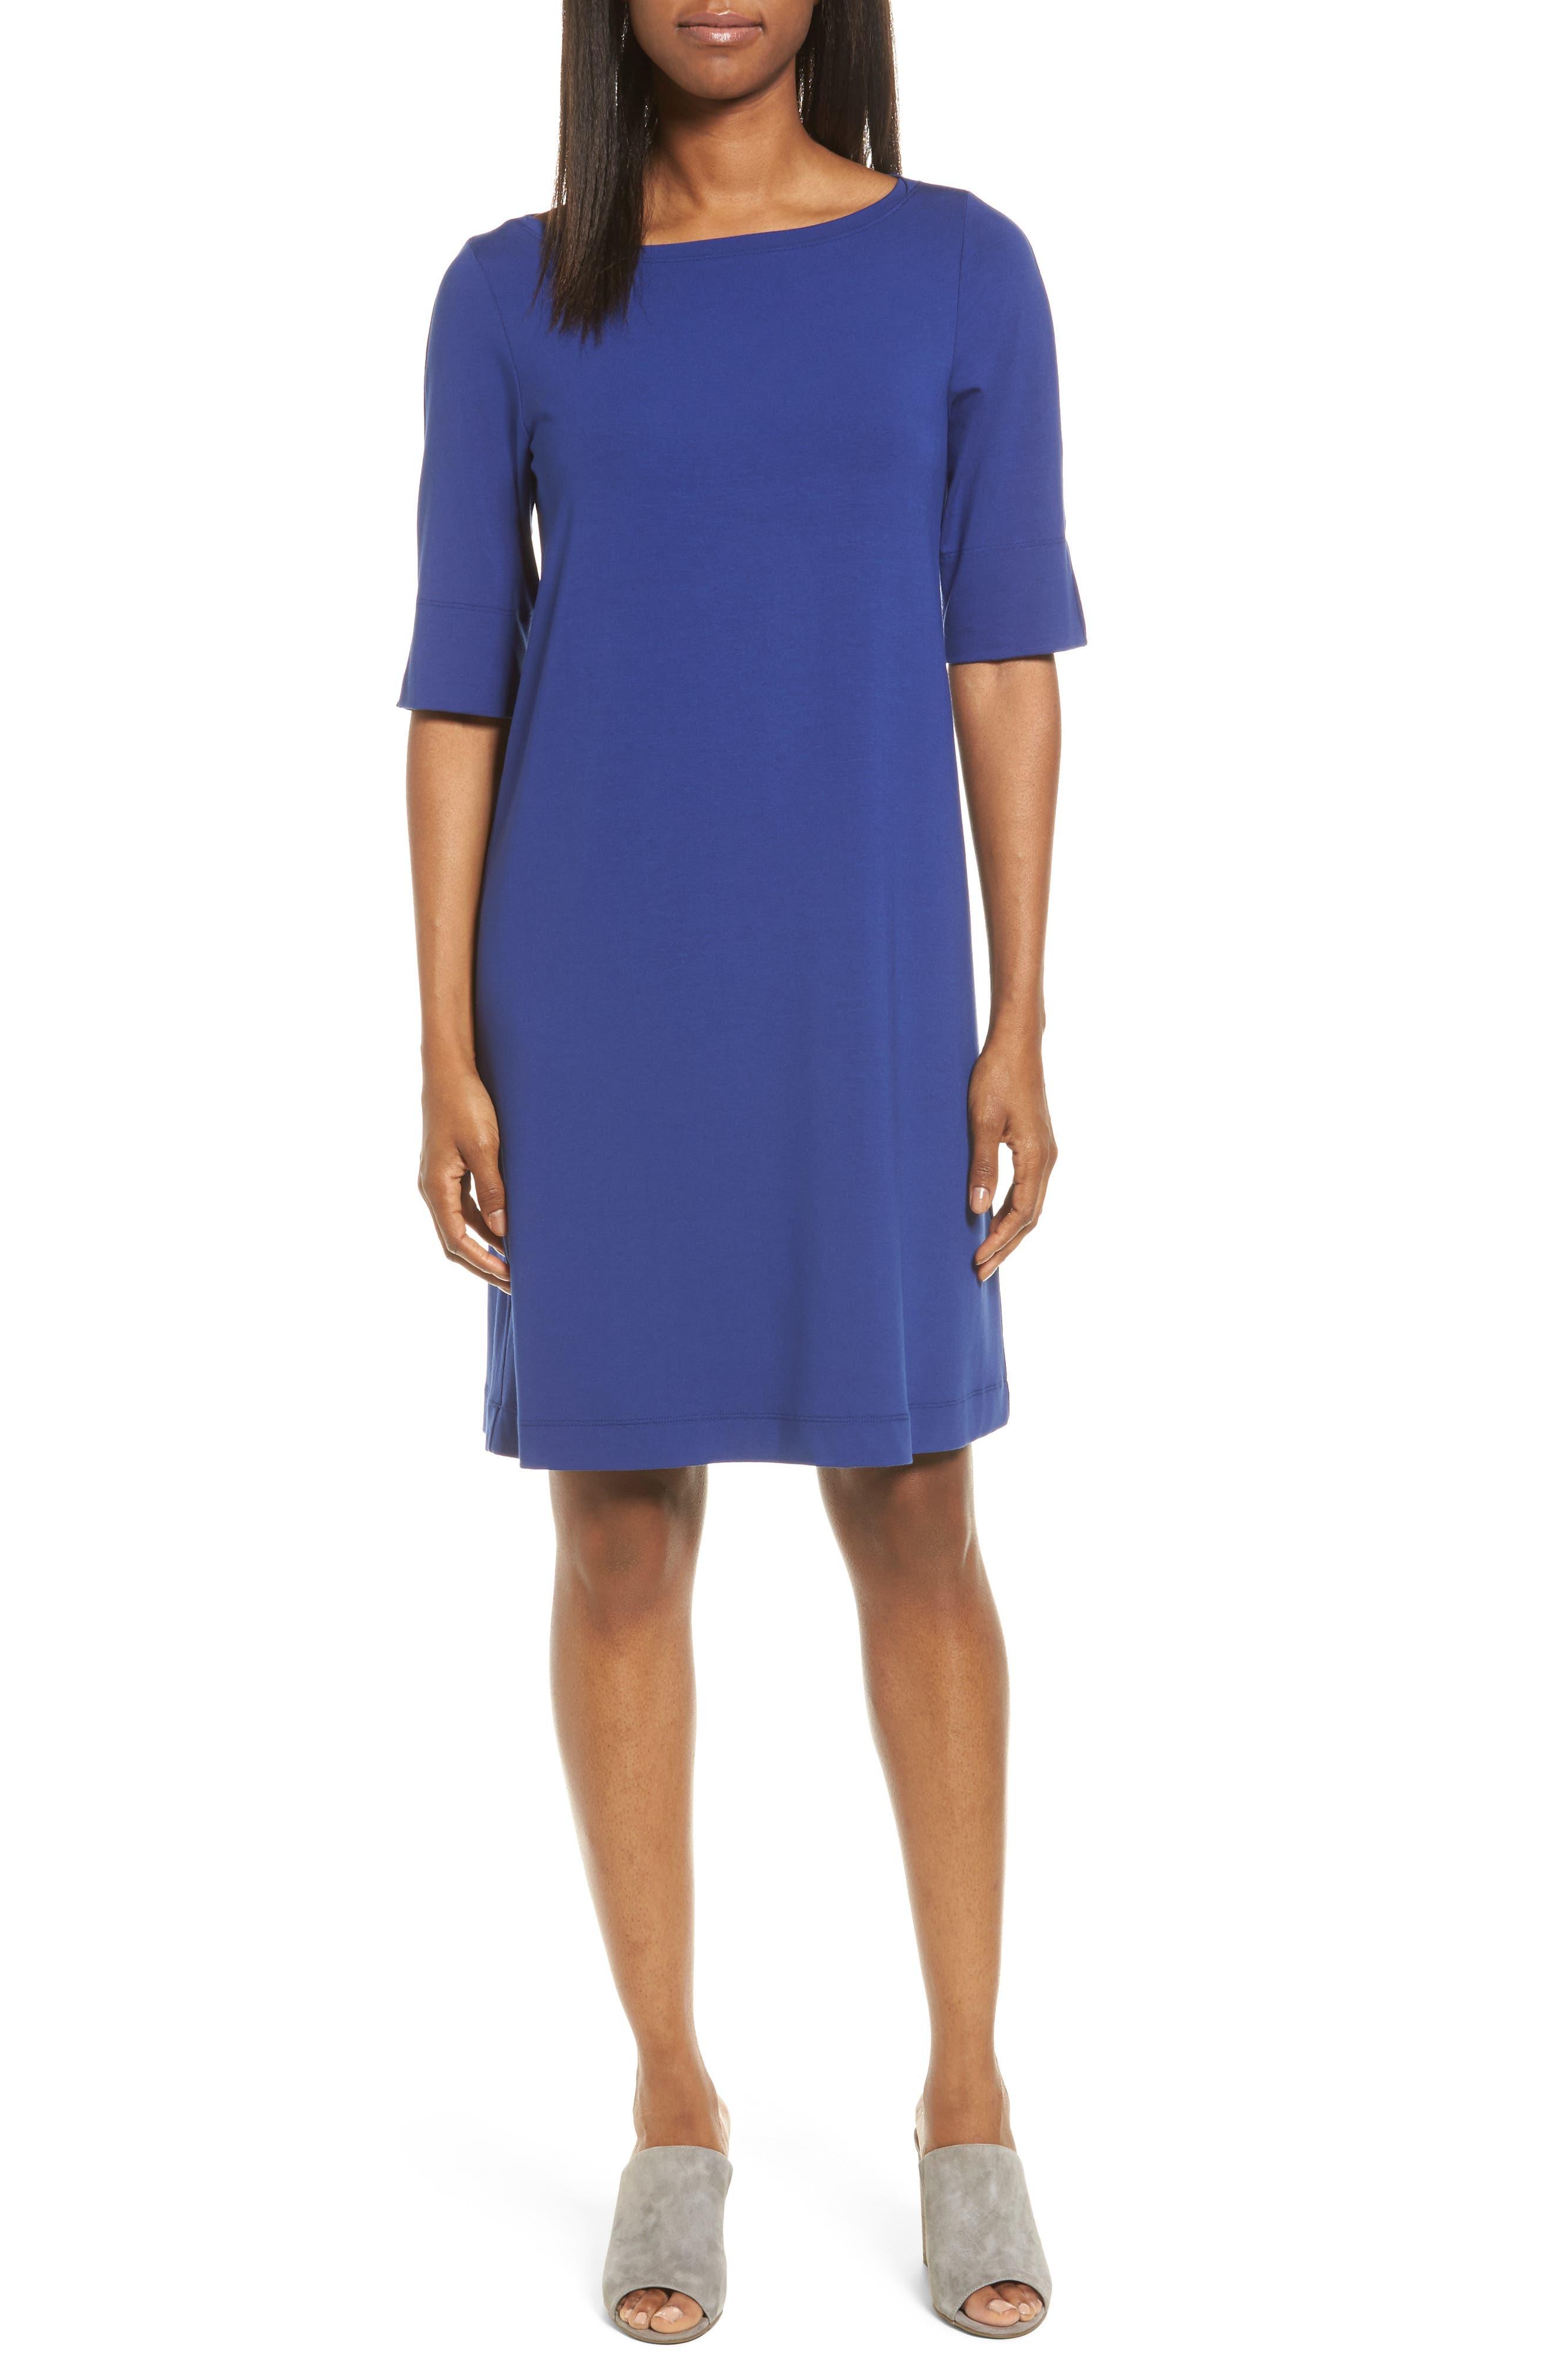 Alternate Image 1 Selected - Eileen Fisher Jersey Shift Dress (Regular & Petite)